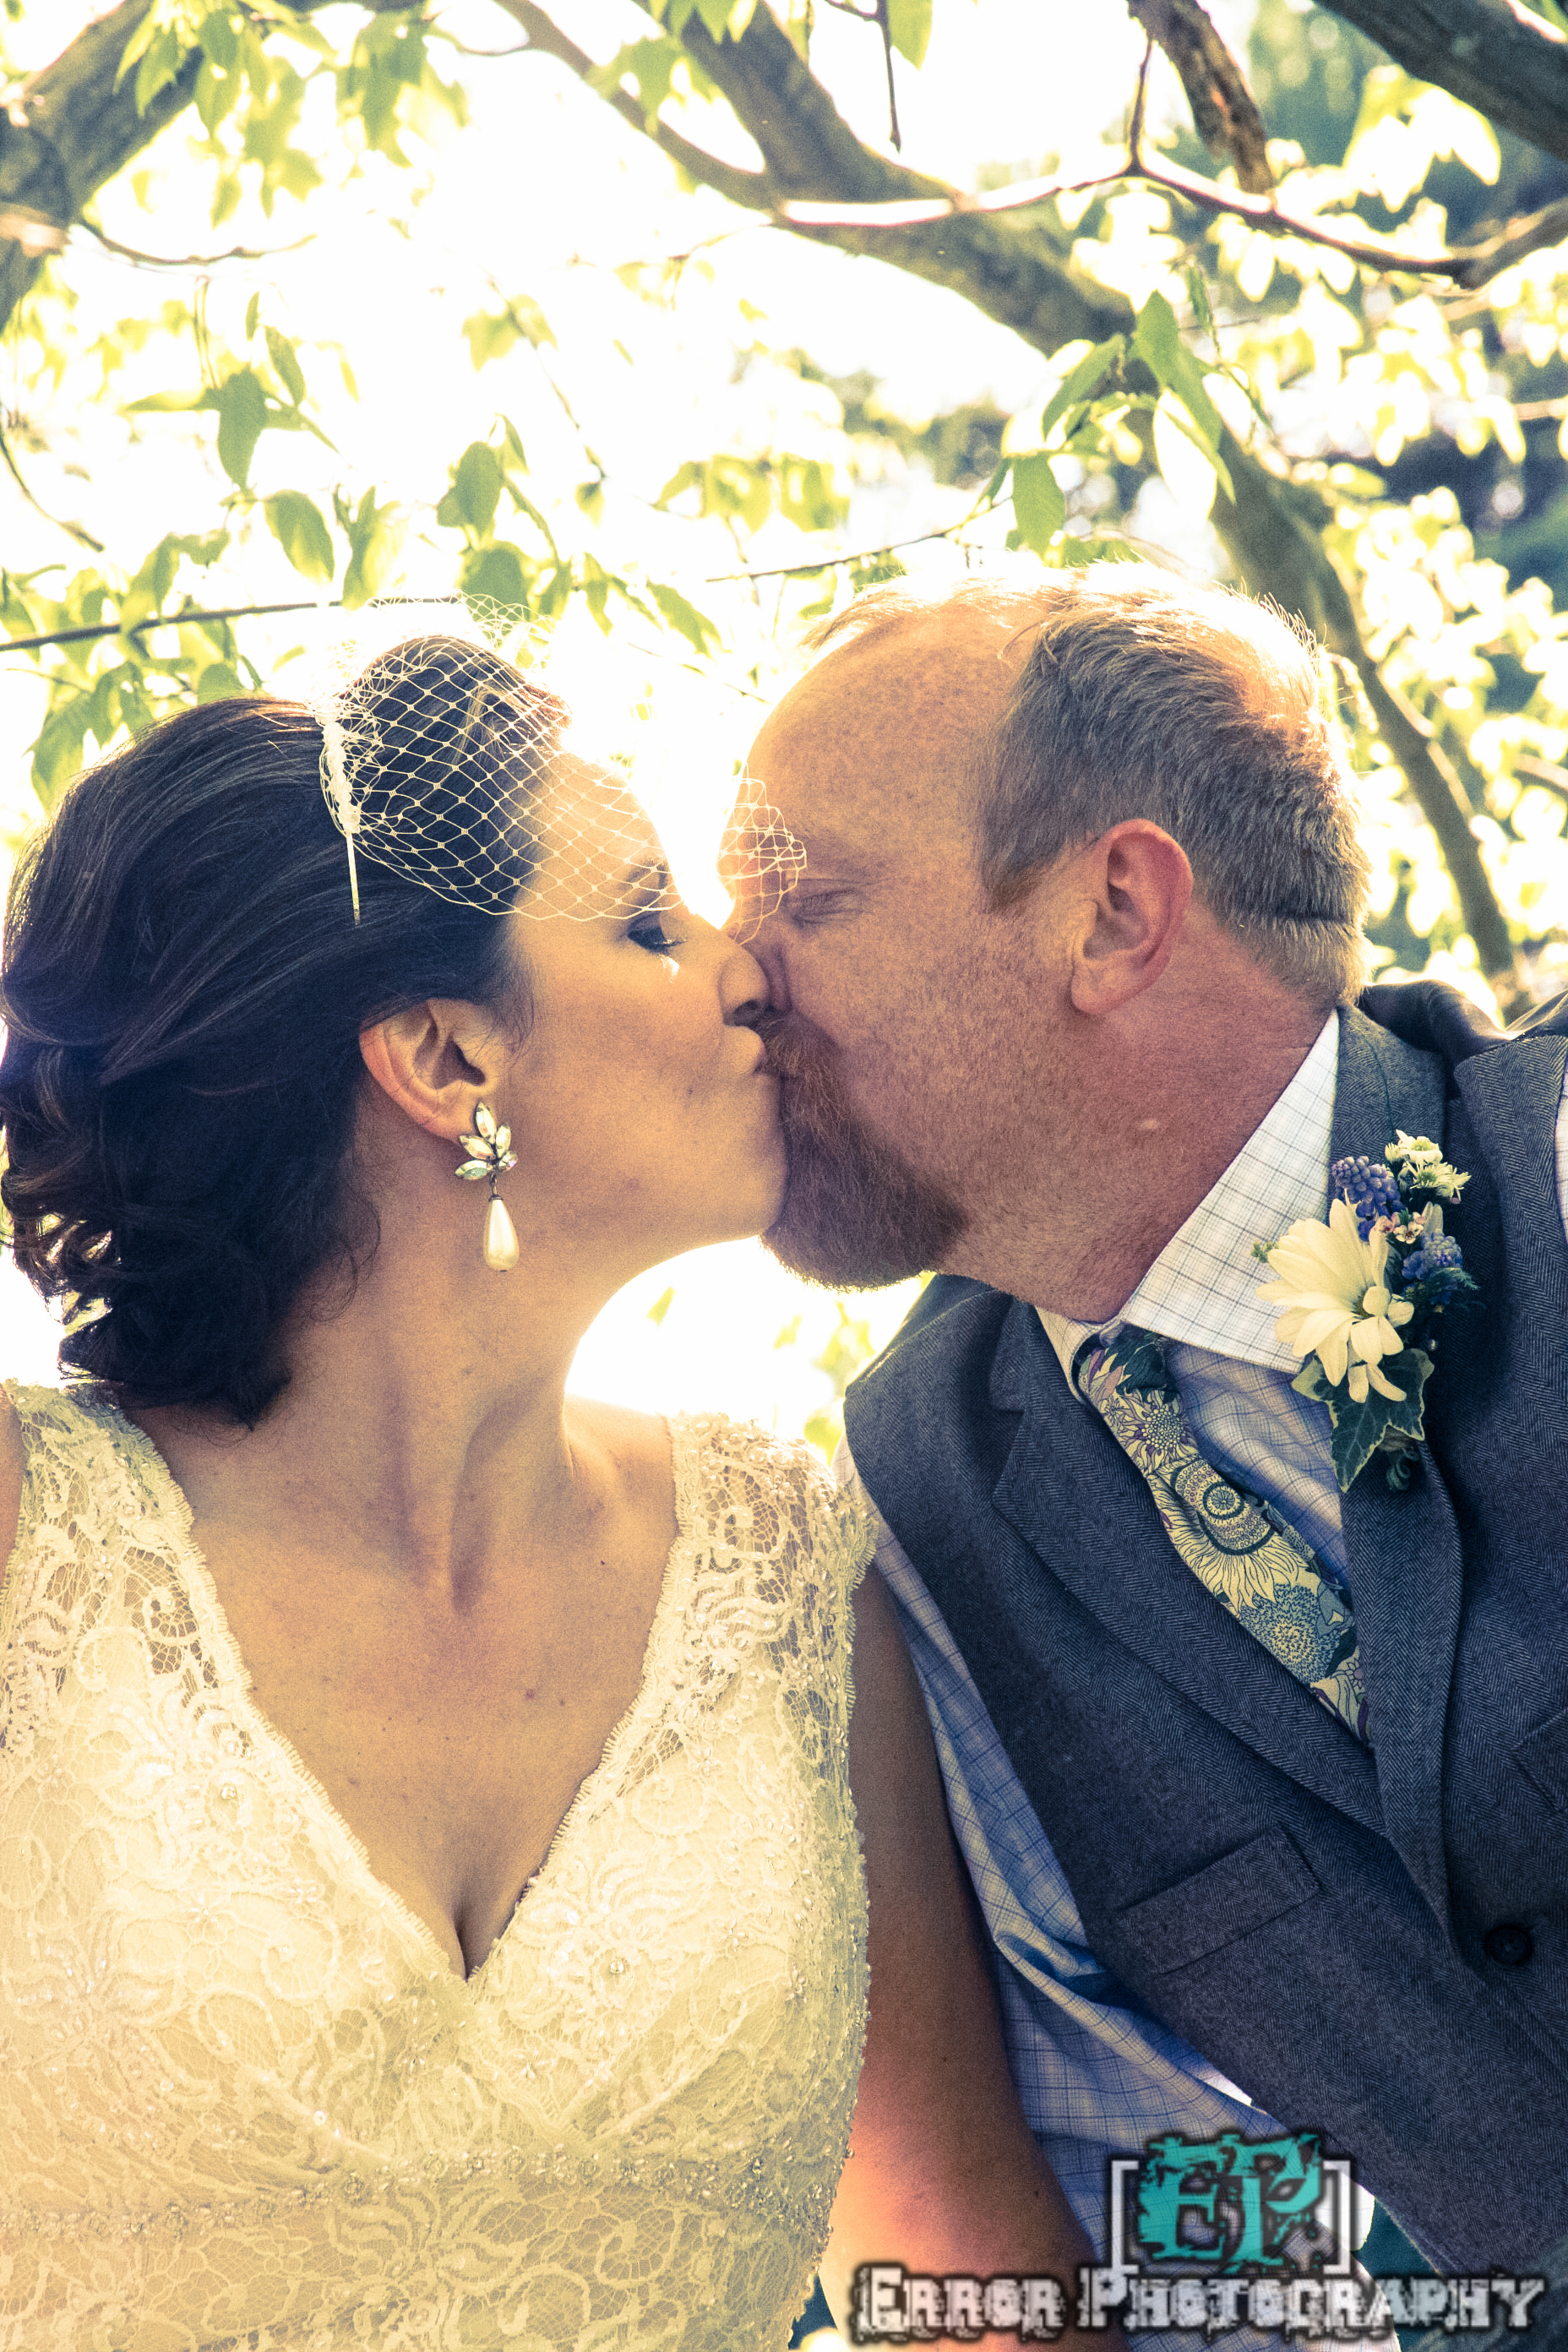 Wedding photos 5-4-13 Error Photography wm-31.jpg